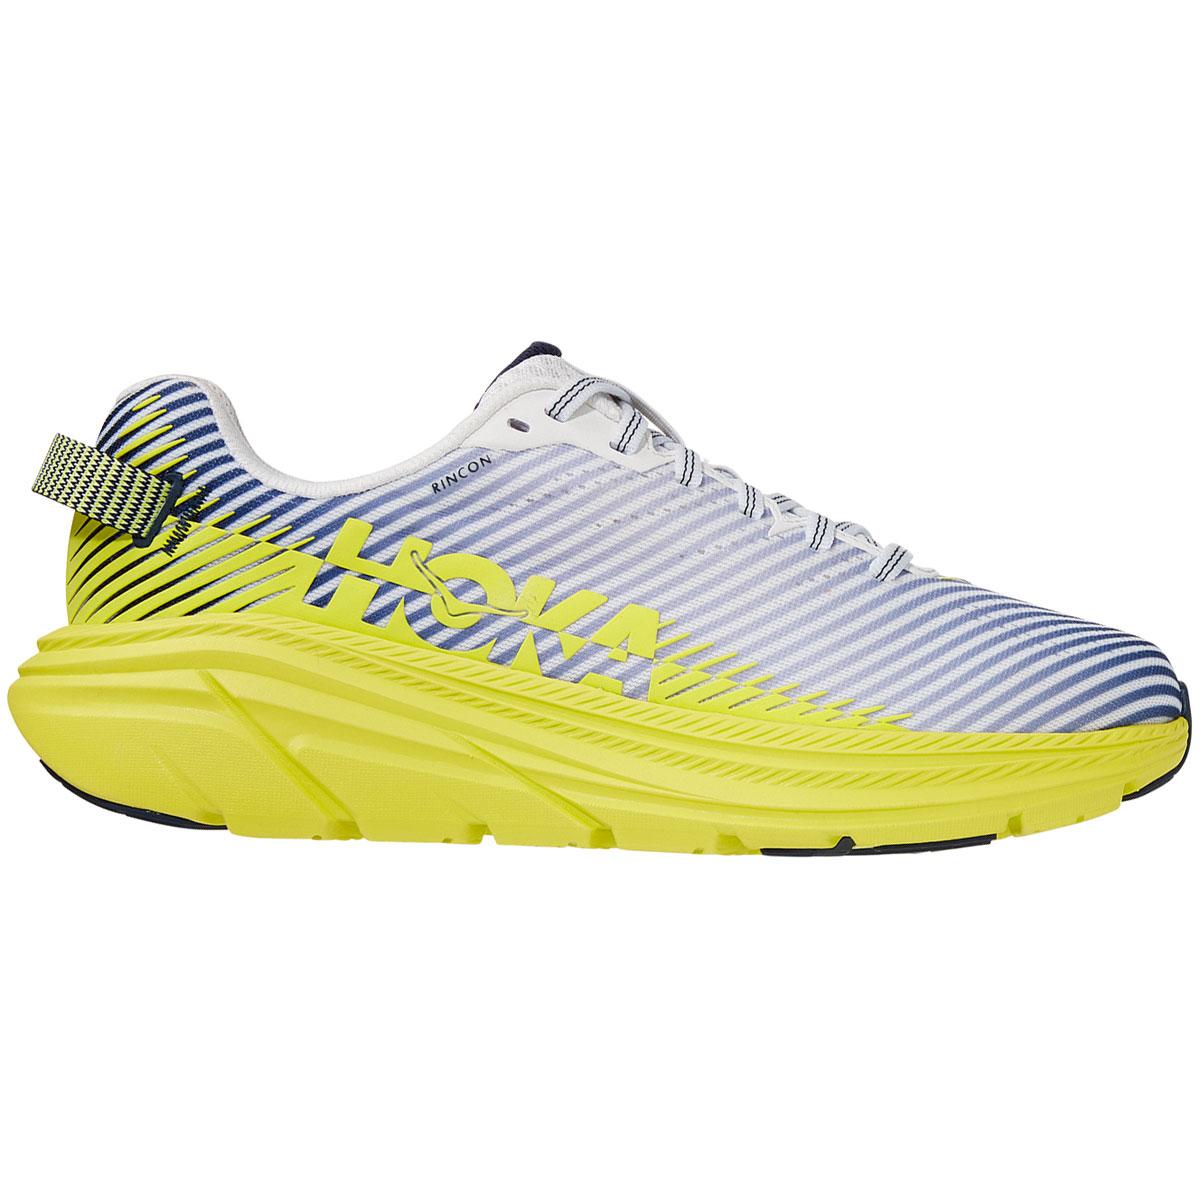 Women's Hoka One One Rincon 2 Running Shoe - Color: Blanc De Blanc - Size: 5.5 - Width: Regular, Blanc De Blanc, large, image 1